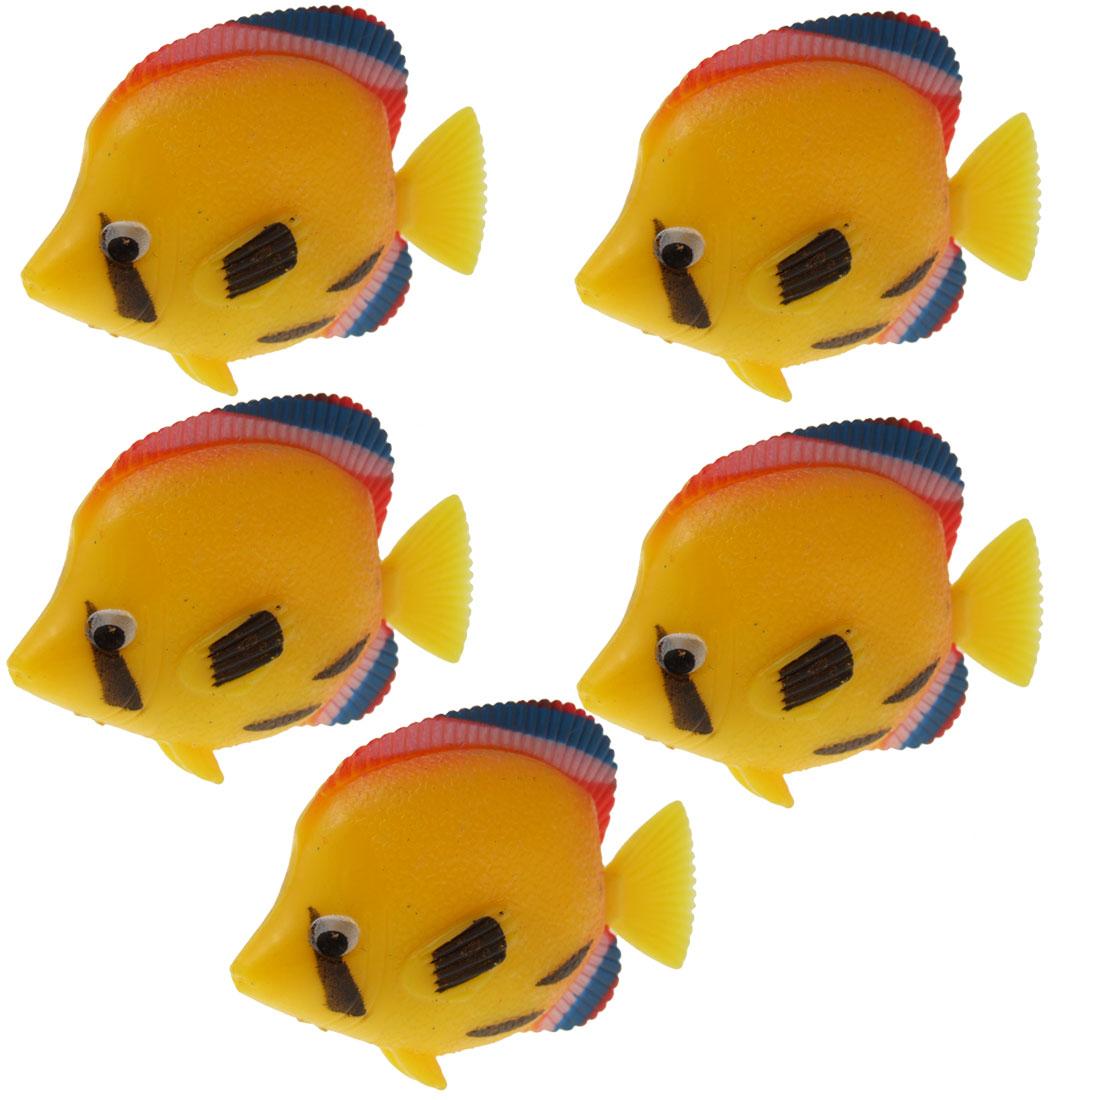 5 PCS Aquarium Tank Plastic Lifelike Yellow Floating Fish